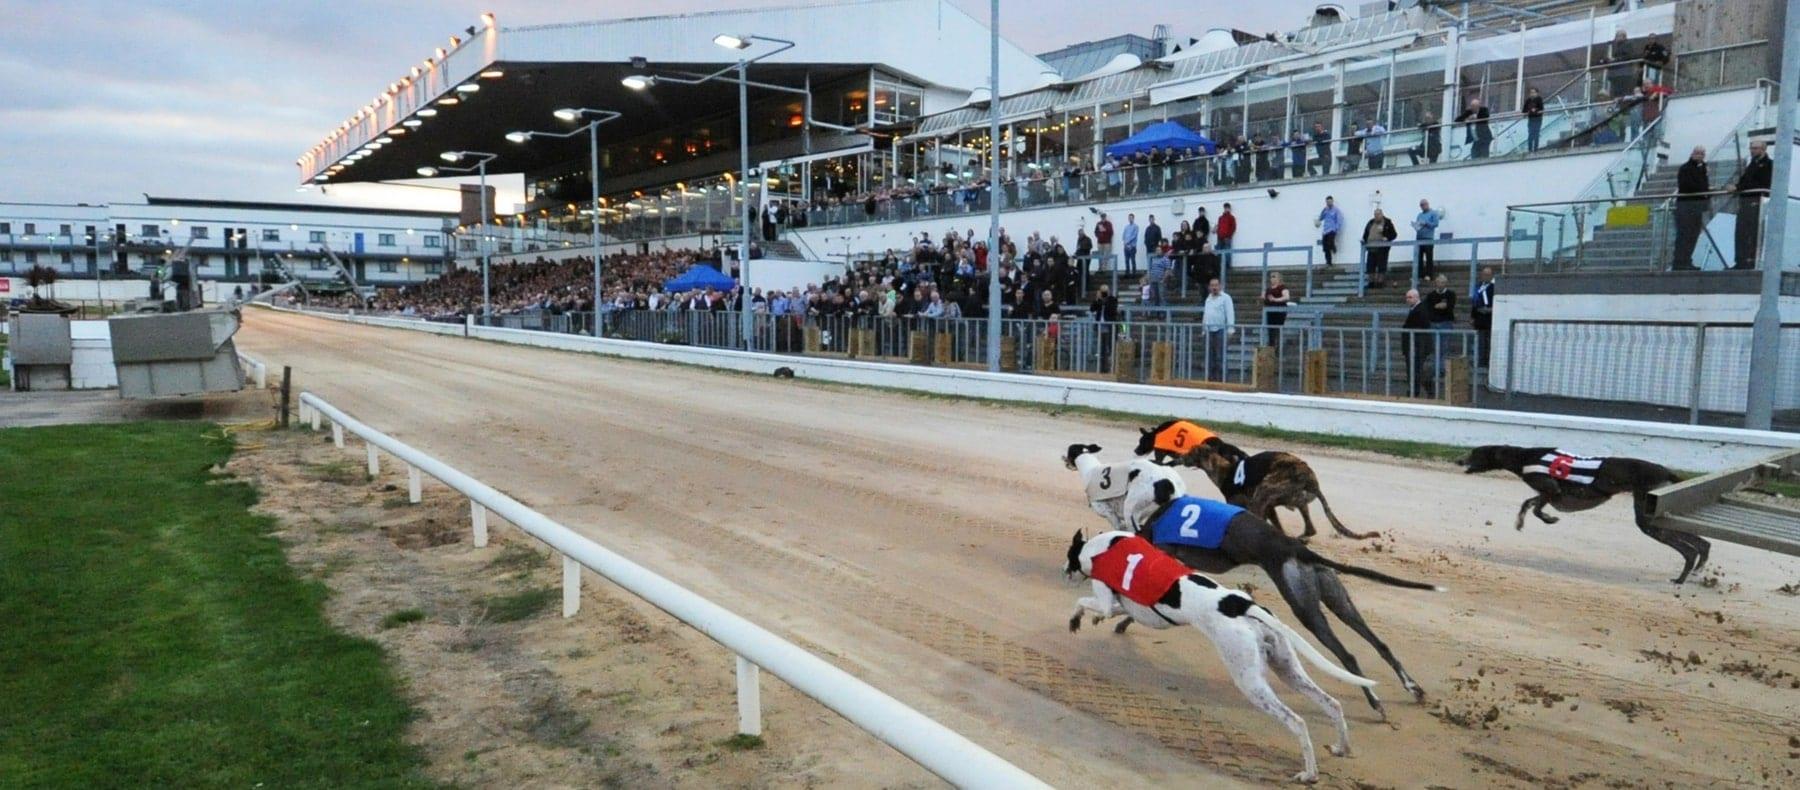 Ladbrokes irish greyhound derby betting results eurovision 2021 uk entry betting lines